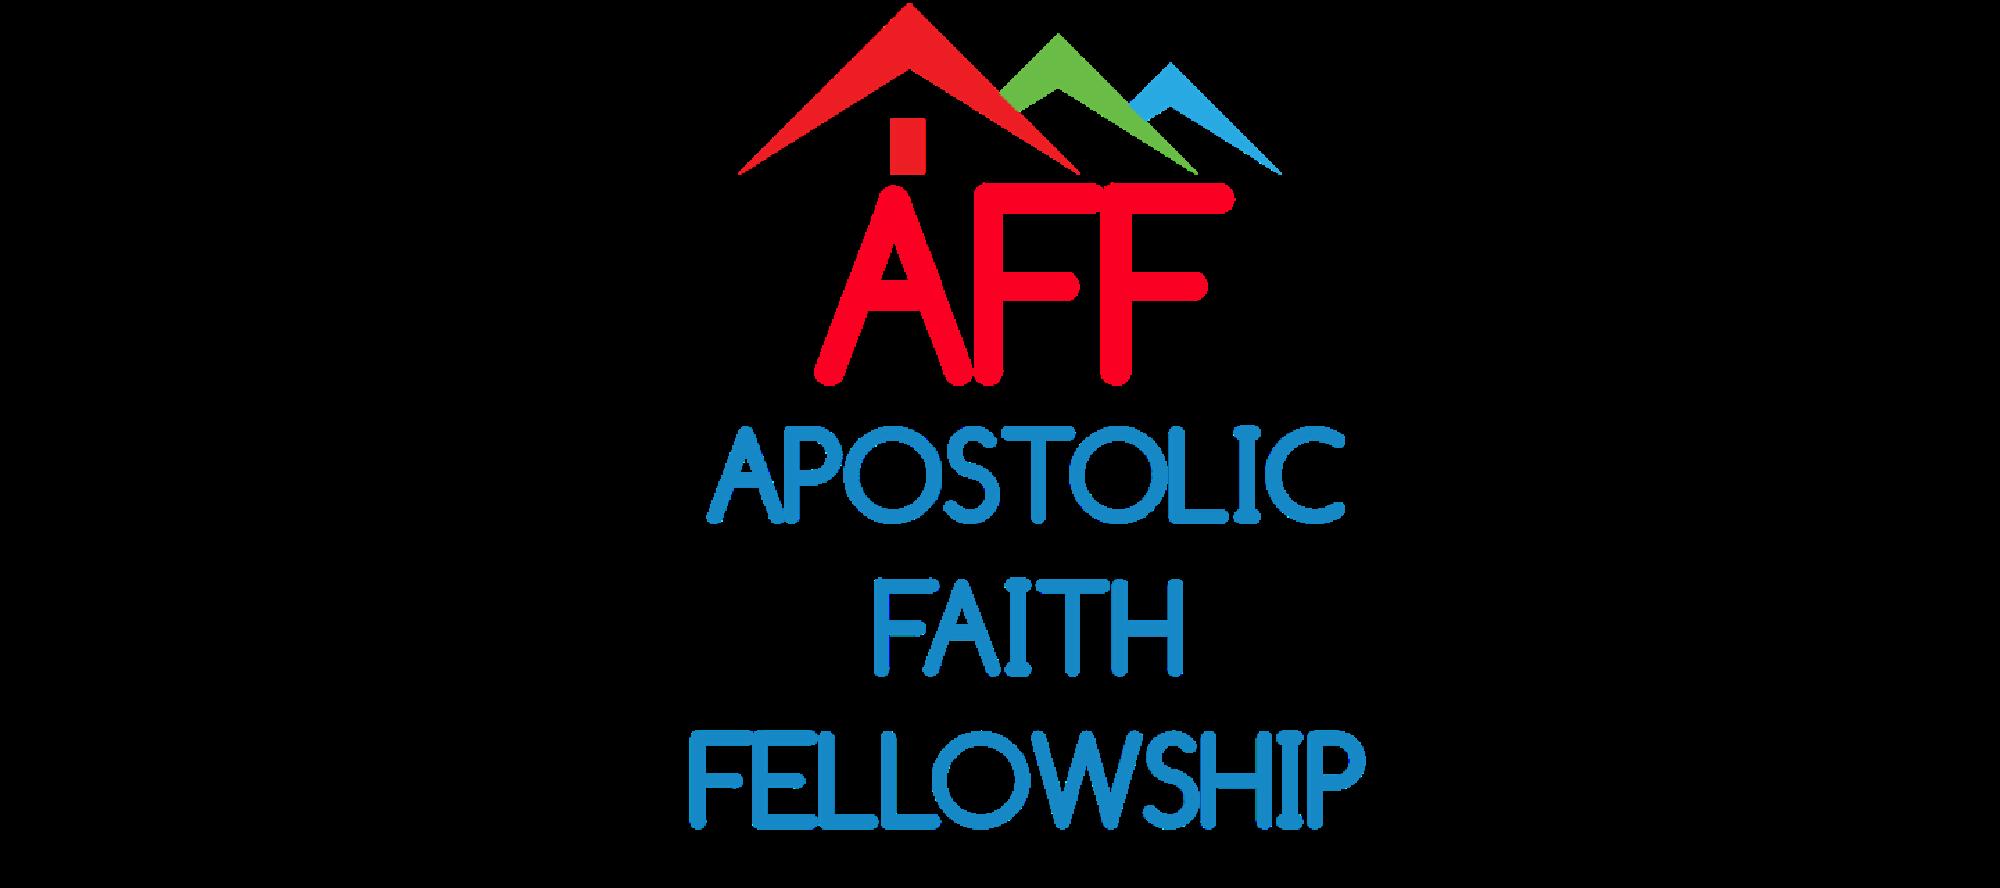 Apostolic Faith Fellowship